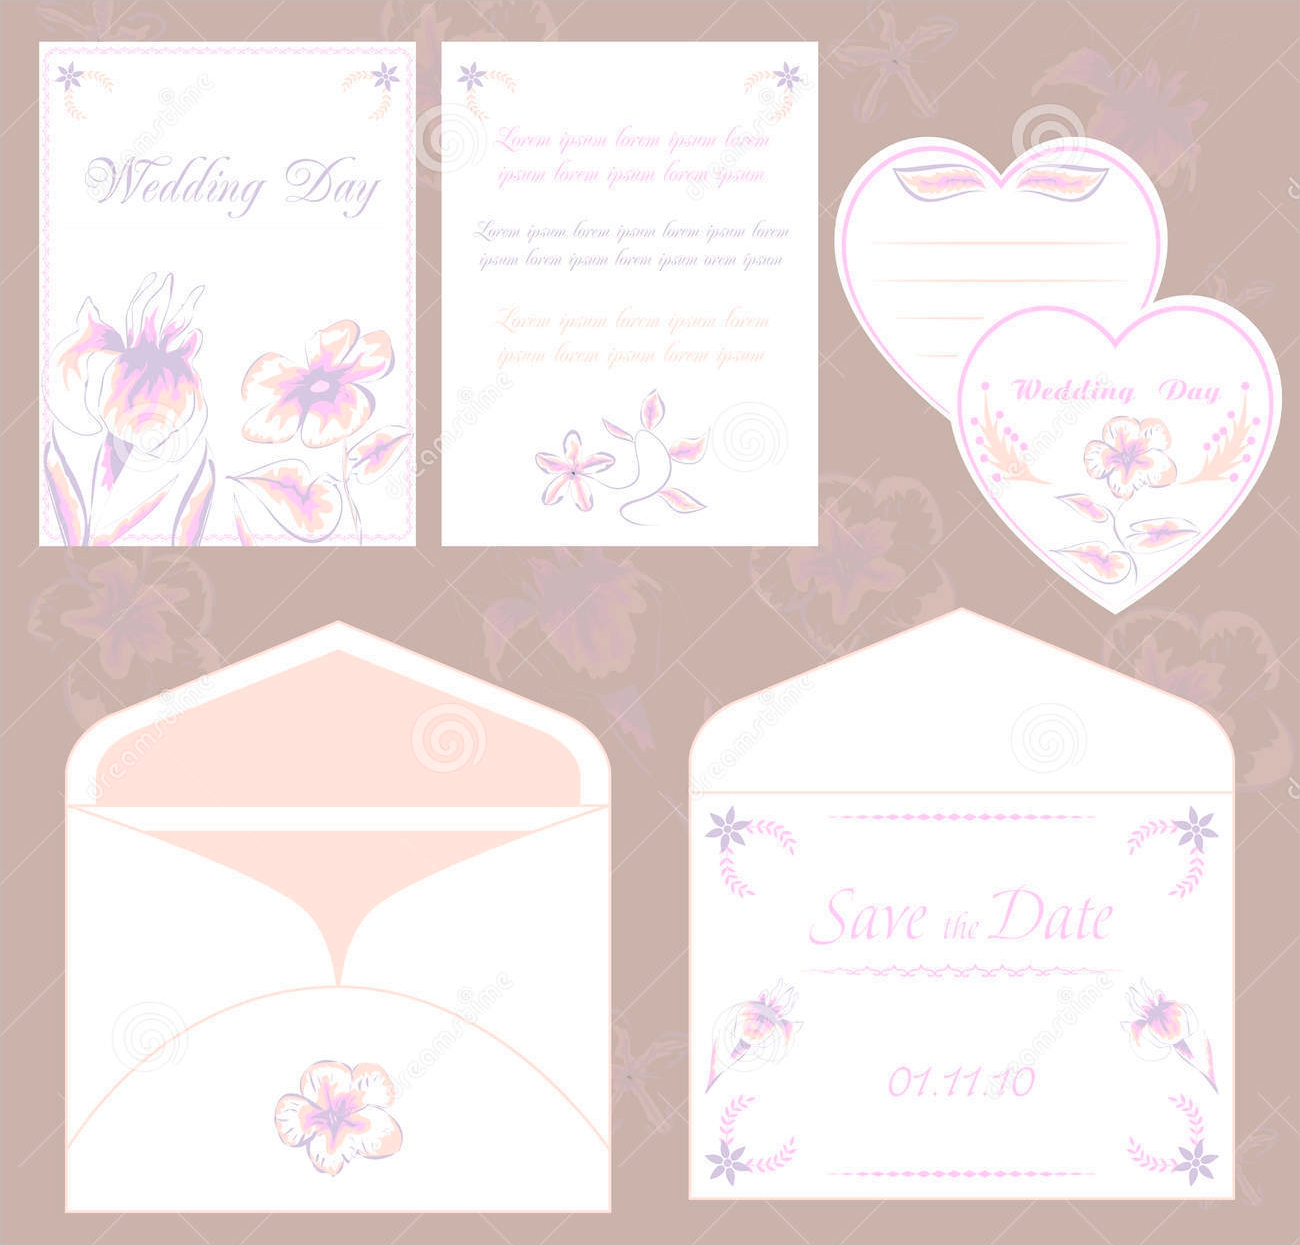 Wedding Invitation Envelope Design Templates Images Wedding - Wedding invitation envelope design templates